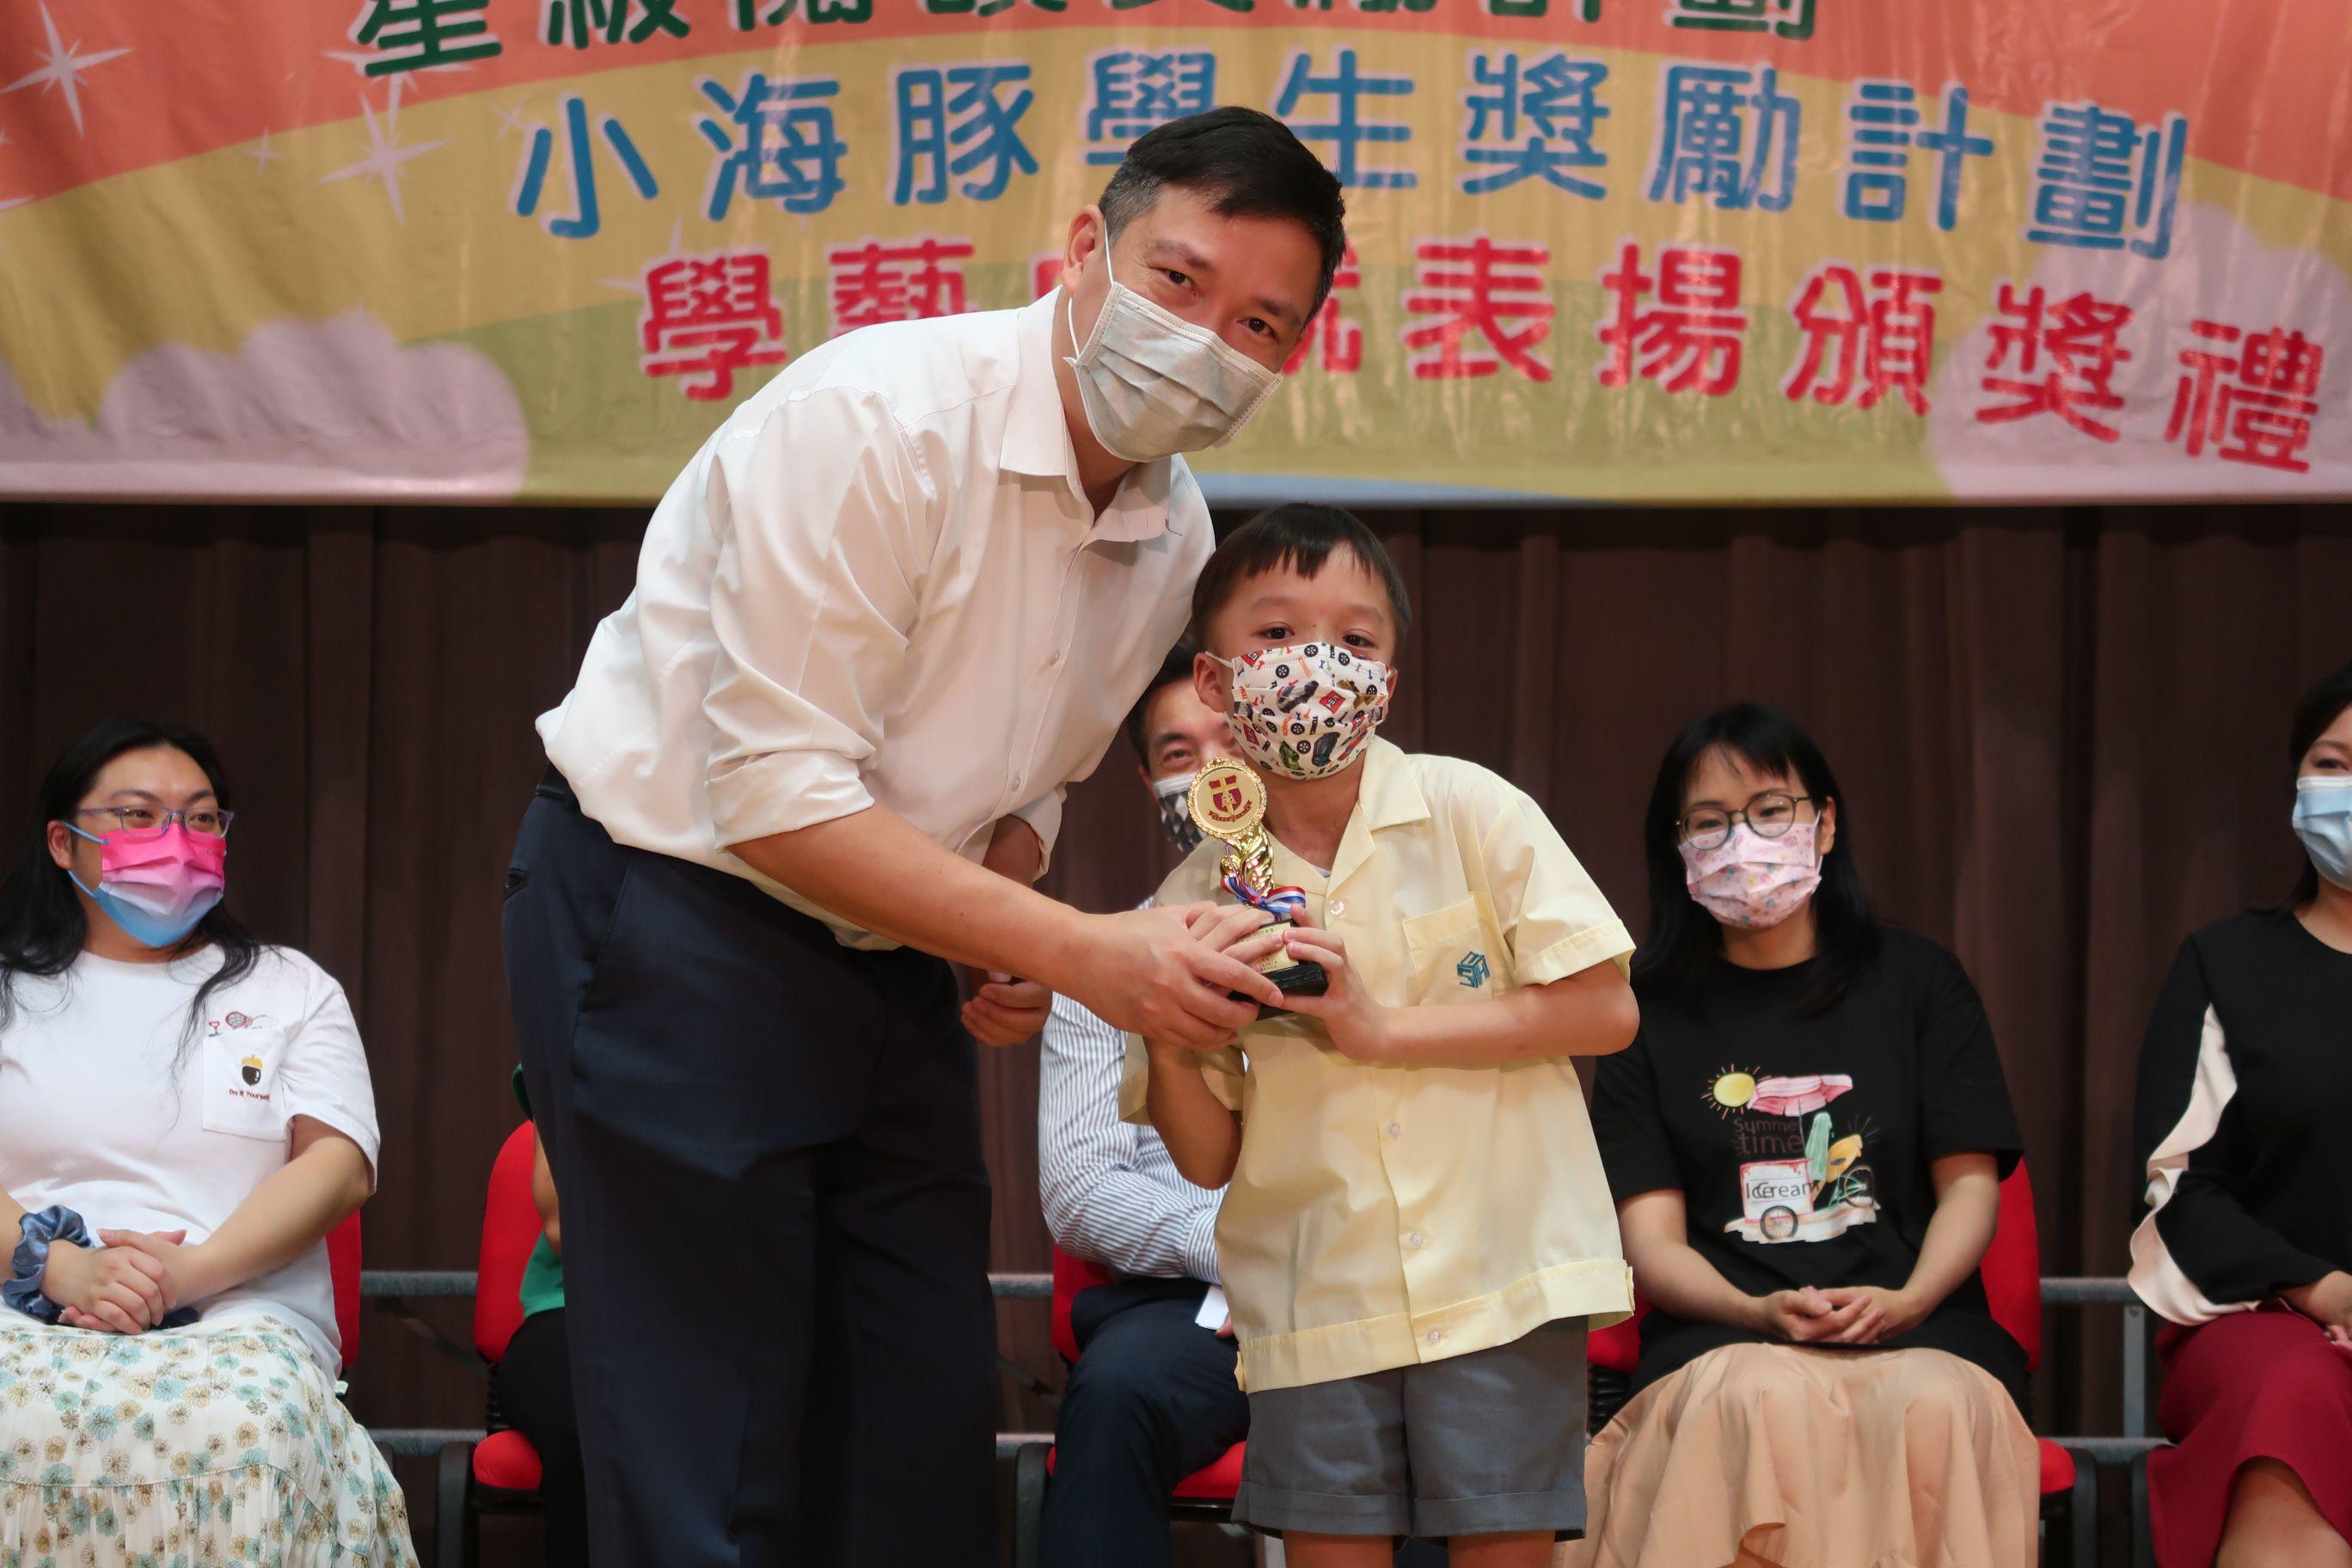 https://syh.edu.hk/sites/default/files/img_5647.jpg